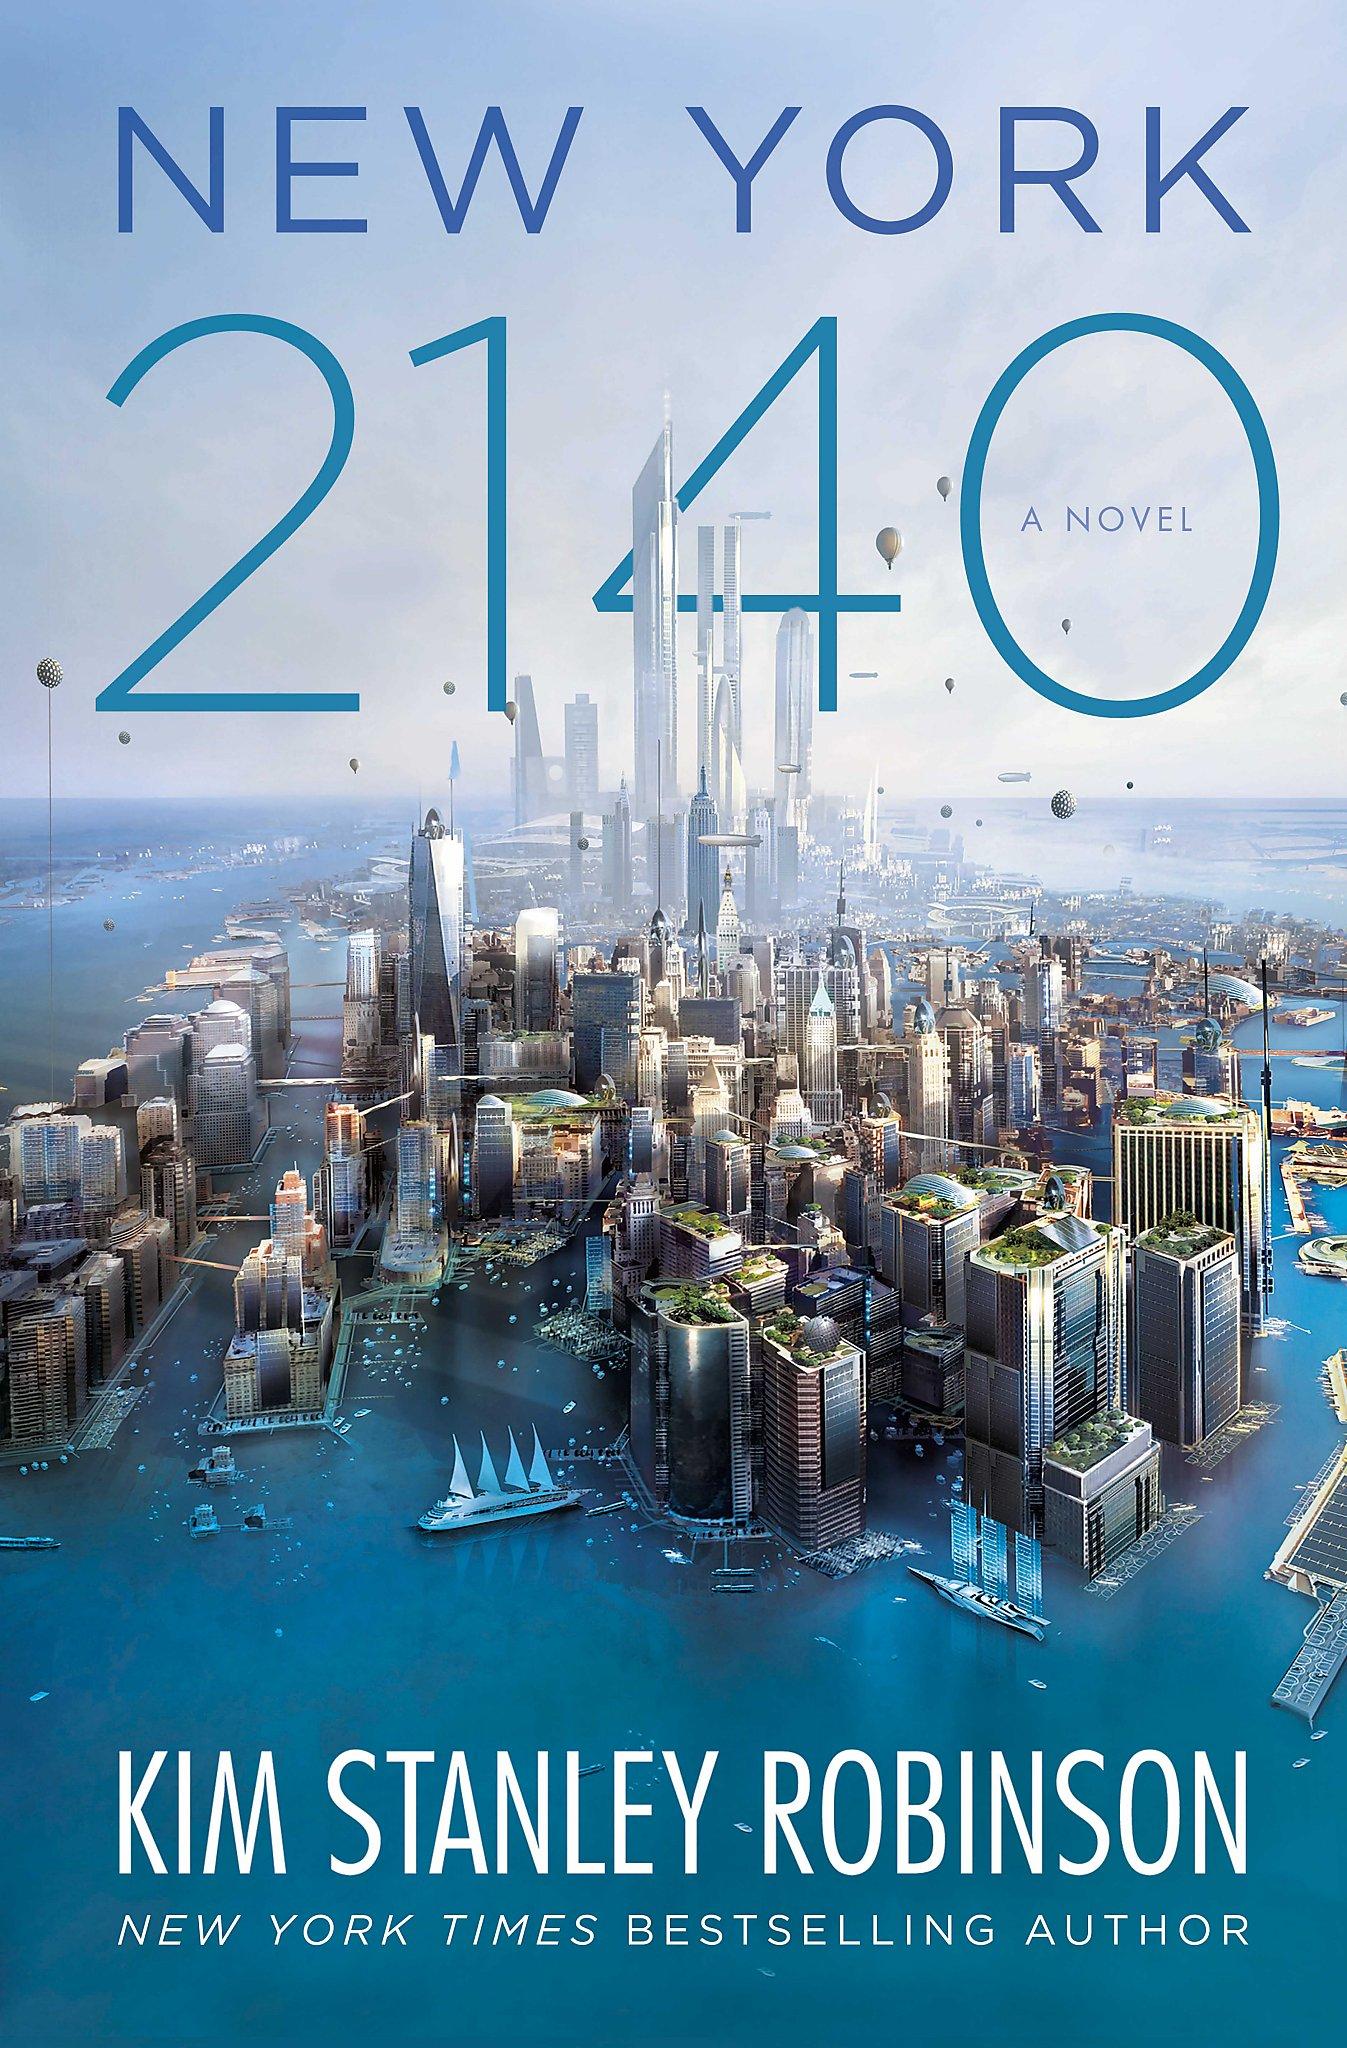 New York 2140,\' by Kim Stanley Robinson - SFGate